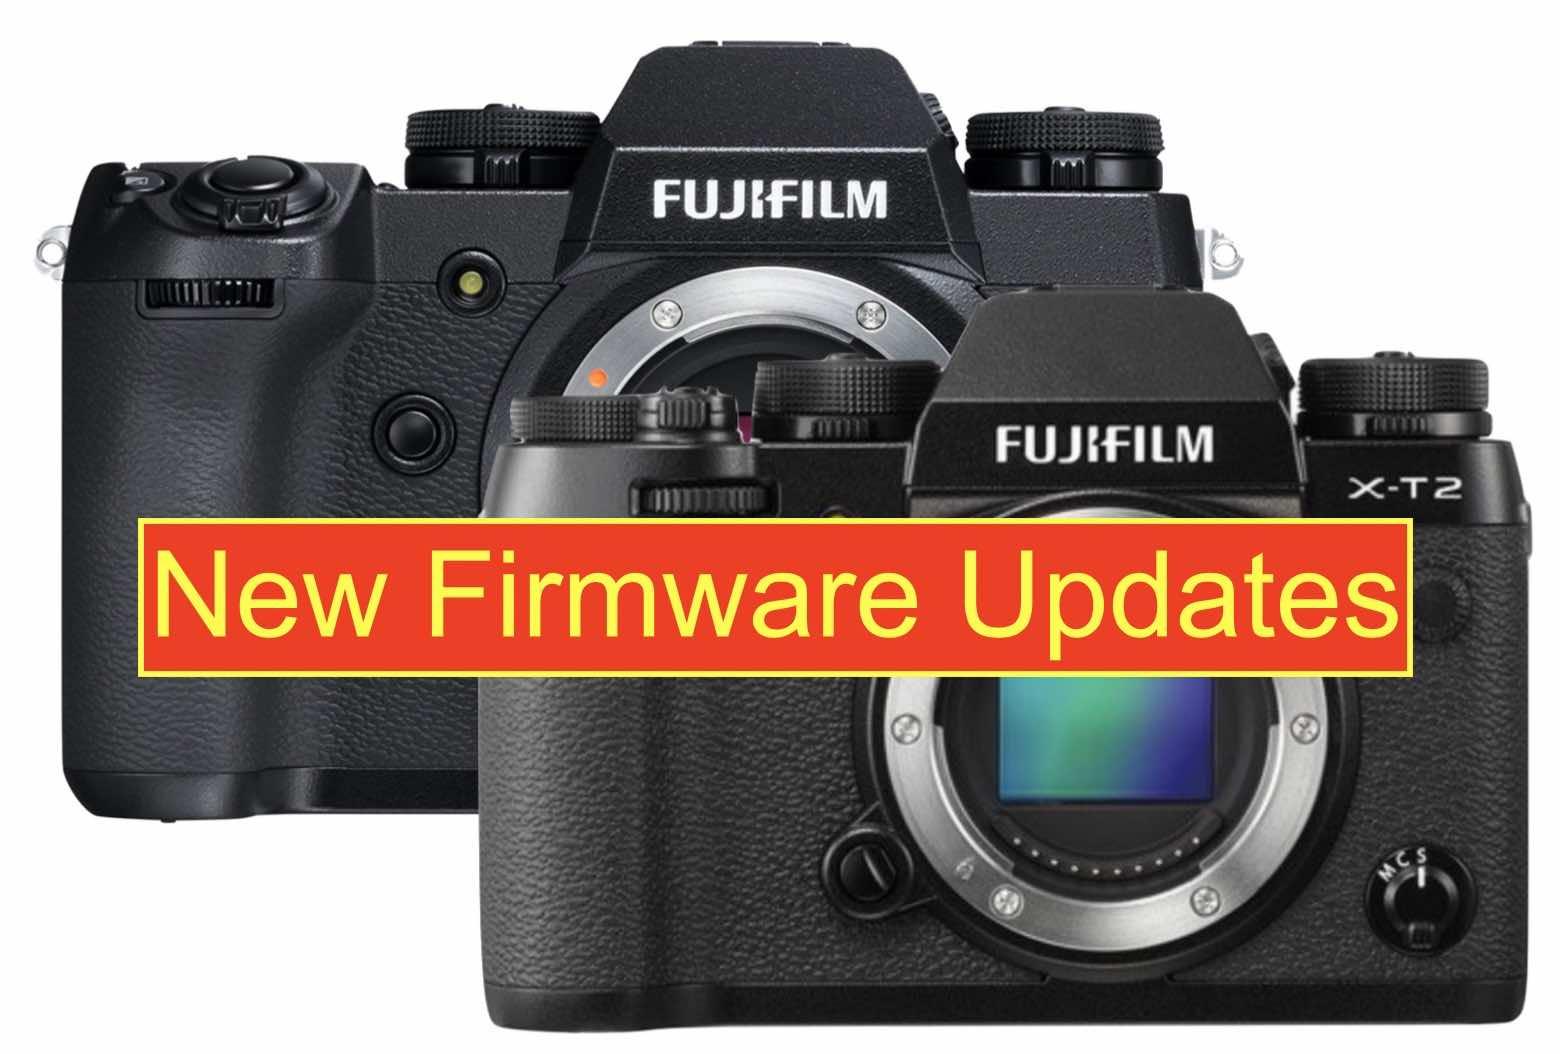 Fujifilm Releases X-T2 Firmware 4.10 and X-H1 Firmware 1.10 - Fuji Rumors